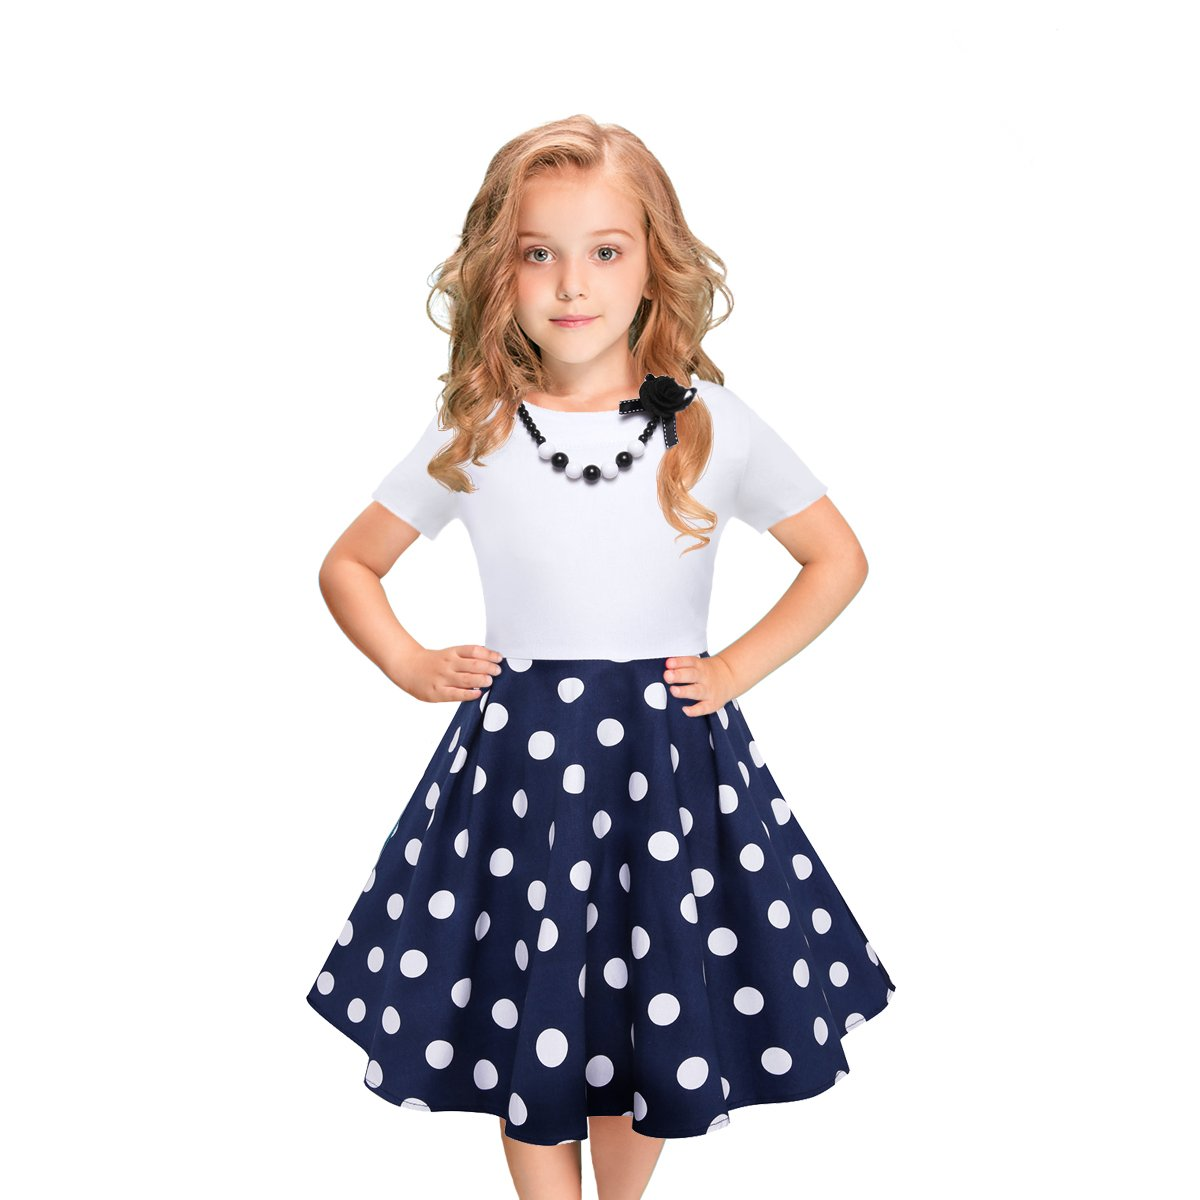 698bd230e6c0 Top 10 wholesale Girls Vintage Dresses - Chinabrands.com